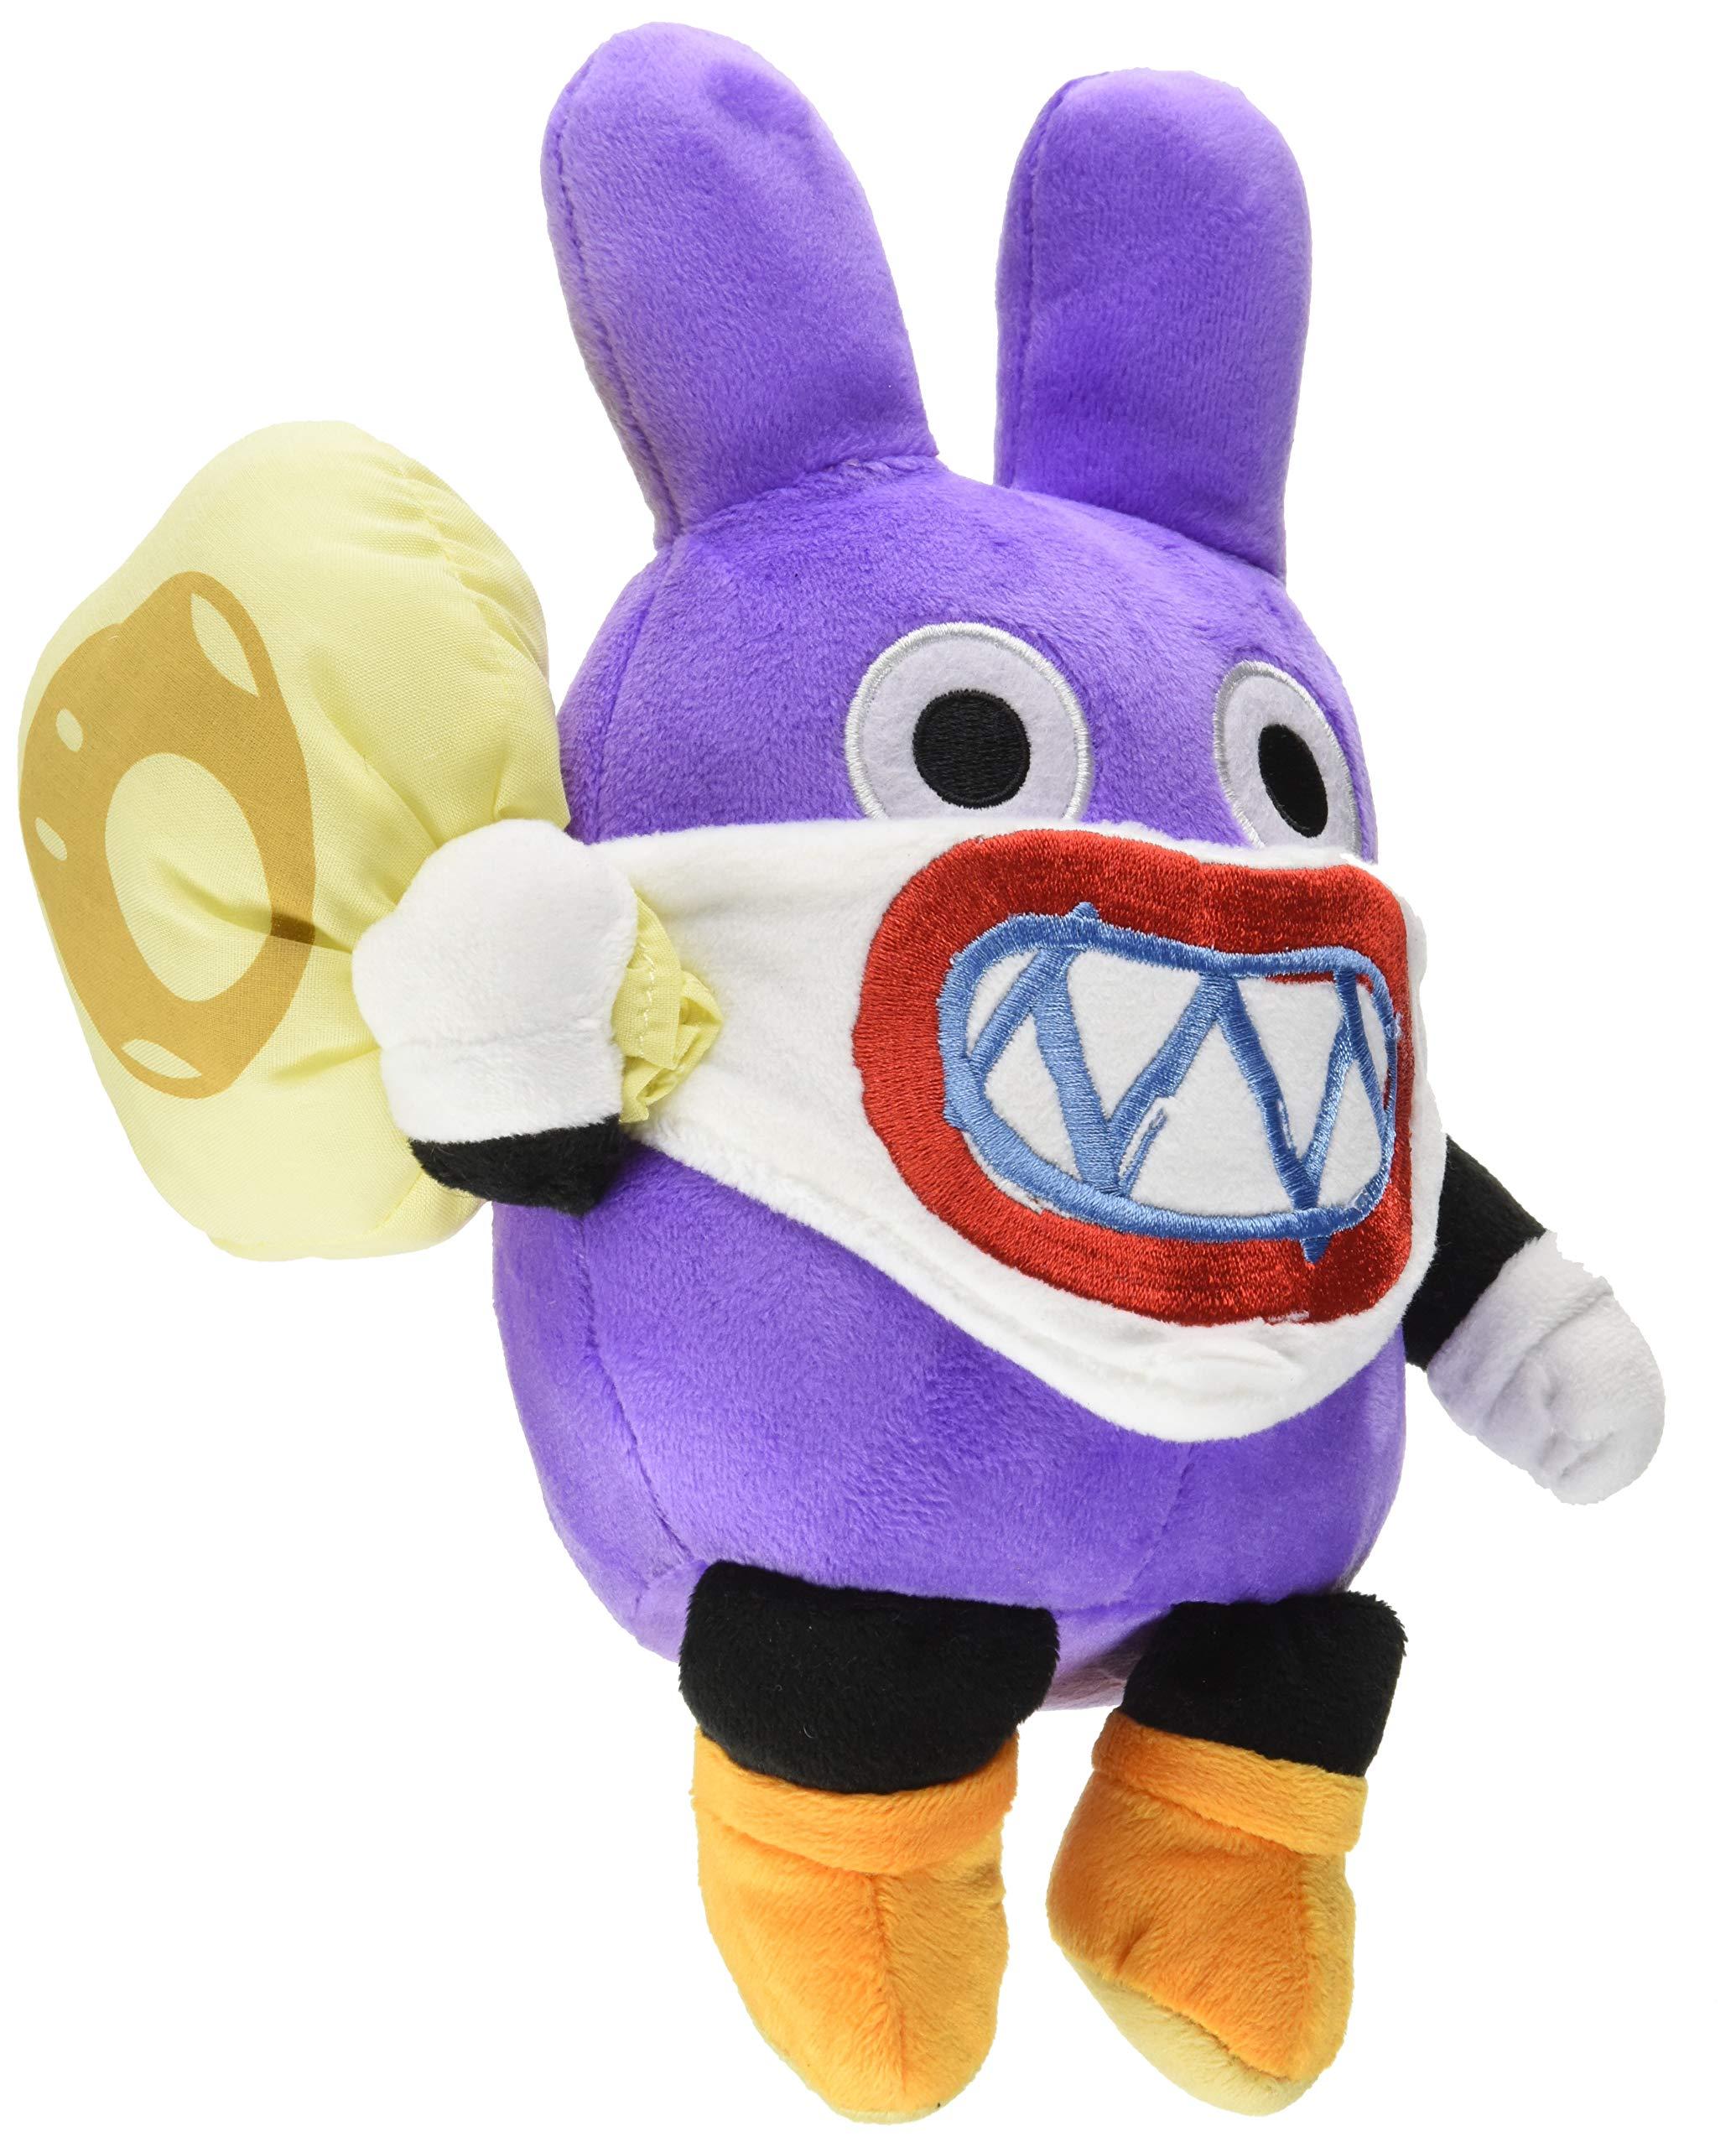 Little Buddy Super Mario Wii U Nabbit Plush, 9'' by Little Buddy